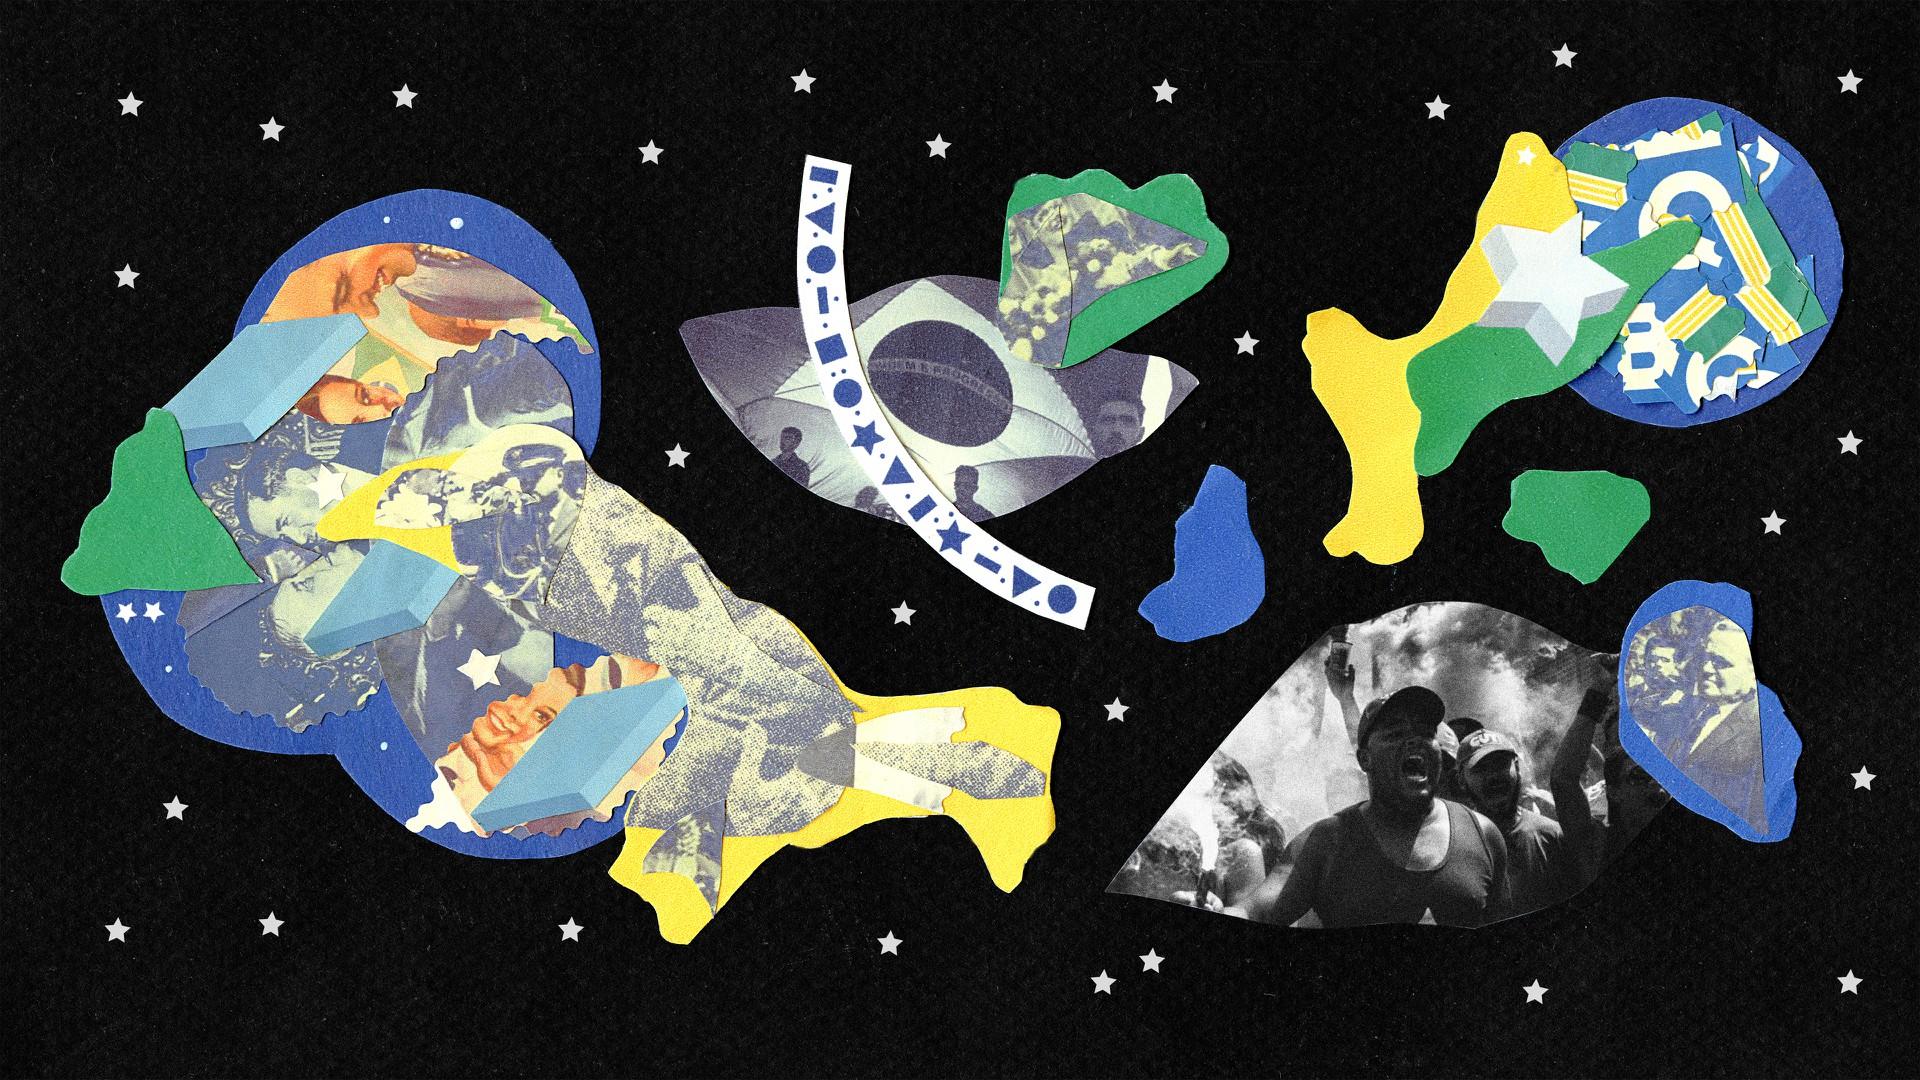 Illustration featuring different Brazil scenes